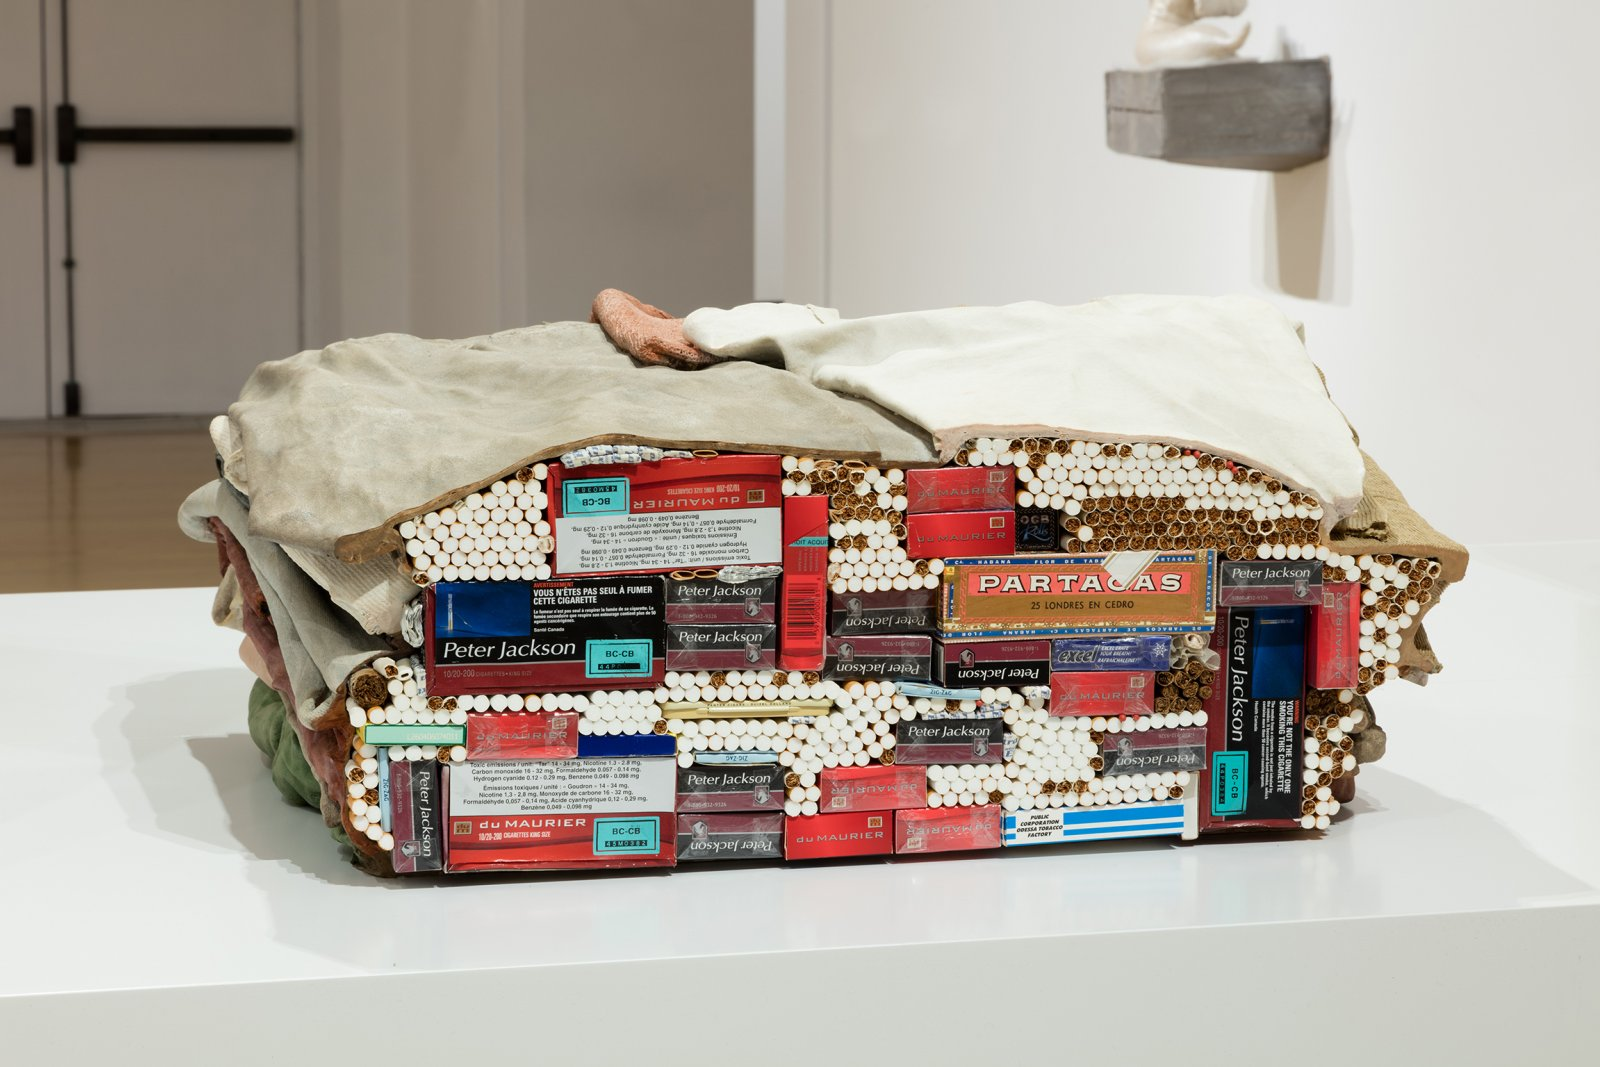 Liz Magor, Carton II, 2006, polymerized gypsum, tobacco, gum, matches, and lighters, 11 x 21 x 19 in. (29 x 53 x 48 cm). Installation view, Habitude, Musée d'art contemporain de Montréal, 2016 by Liz Magor